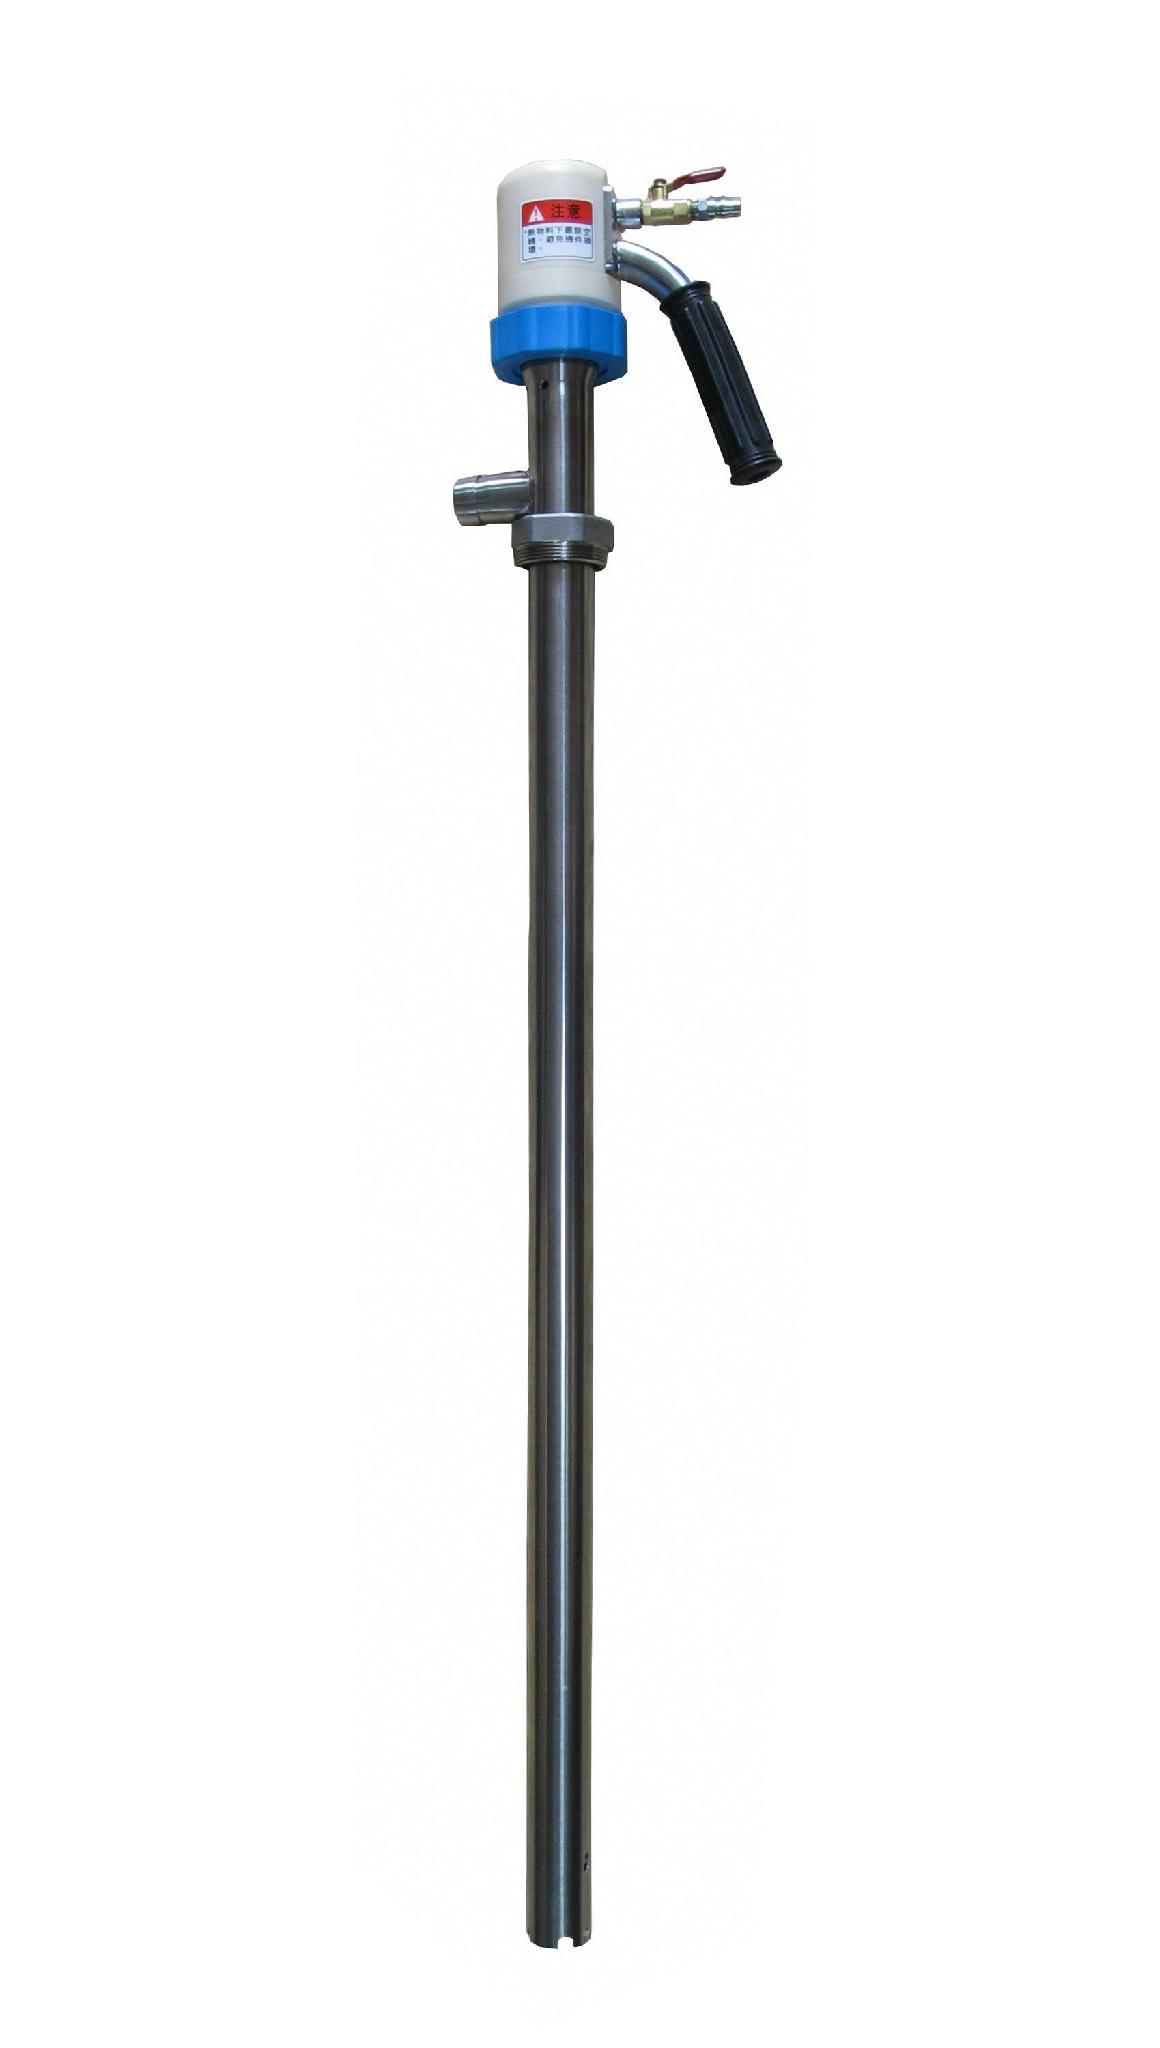 Air-operated portable spiral pump